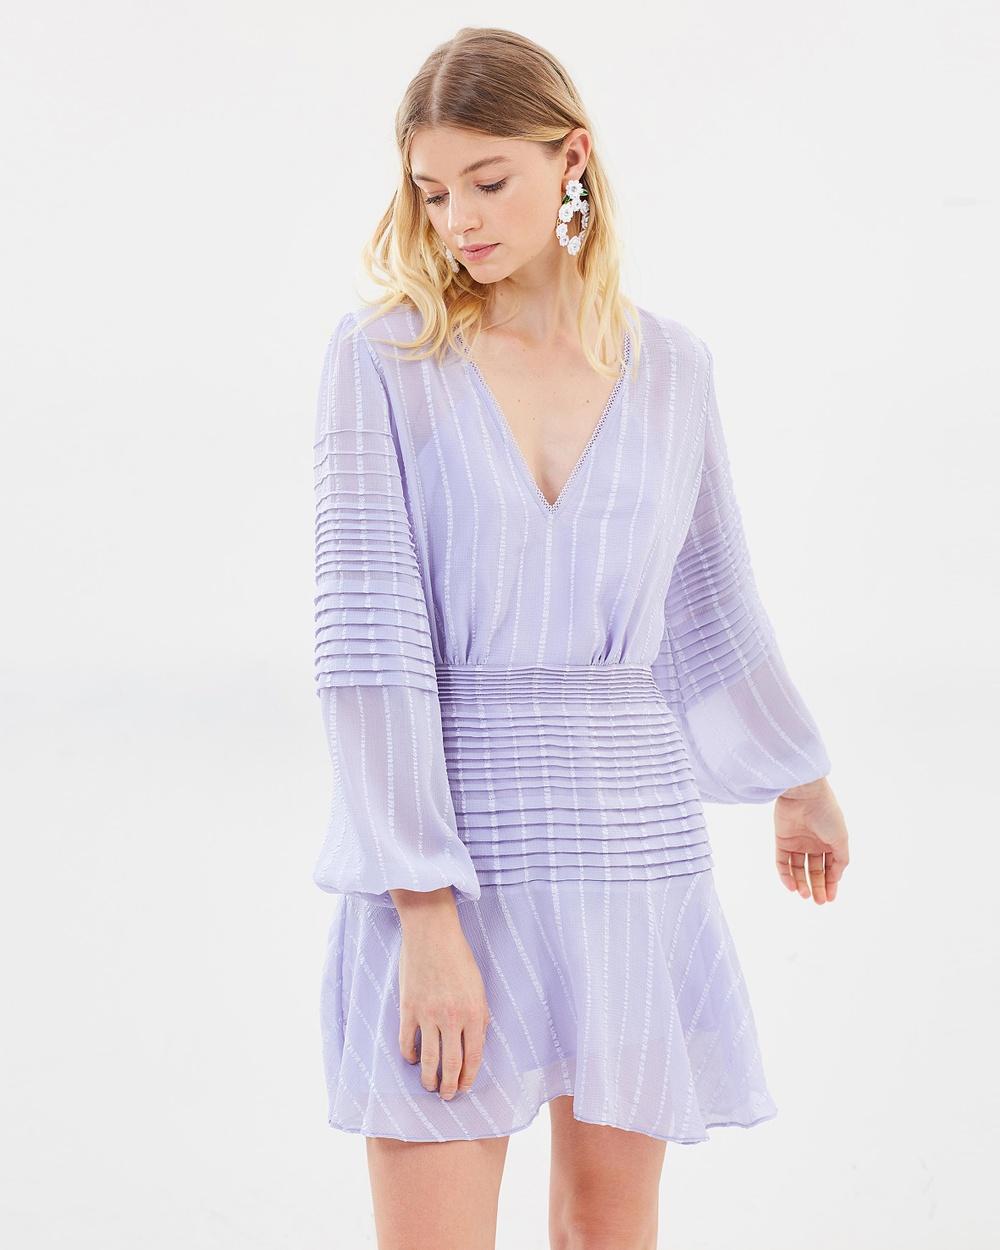 Talulah Chaleur Long Sleeve Mini Dress Dresses Lavander Chaleur Long Sleeve Mini Dress